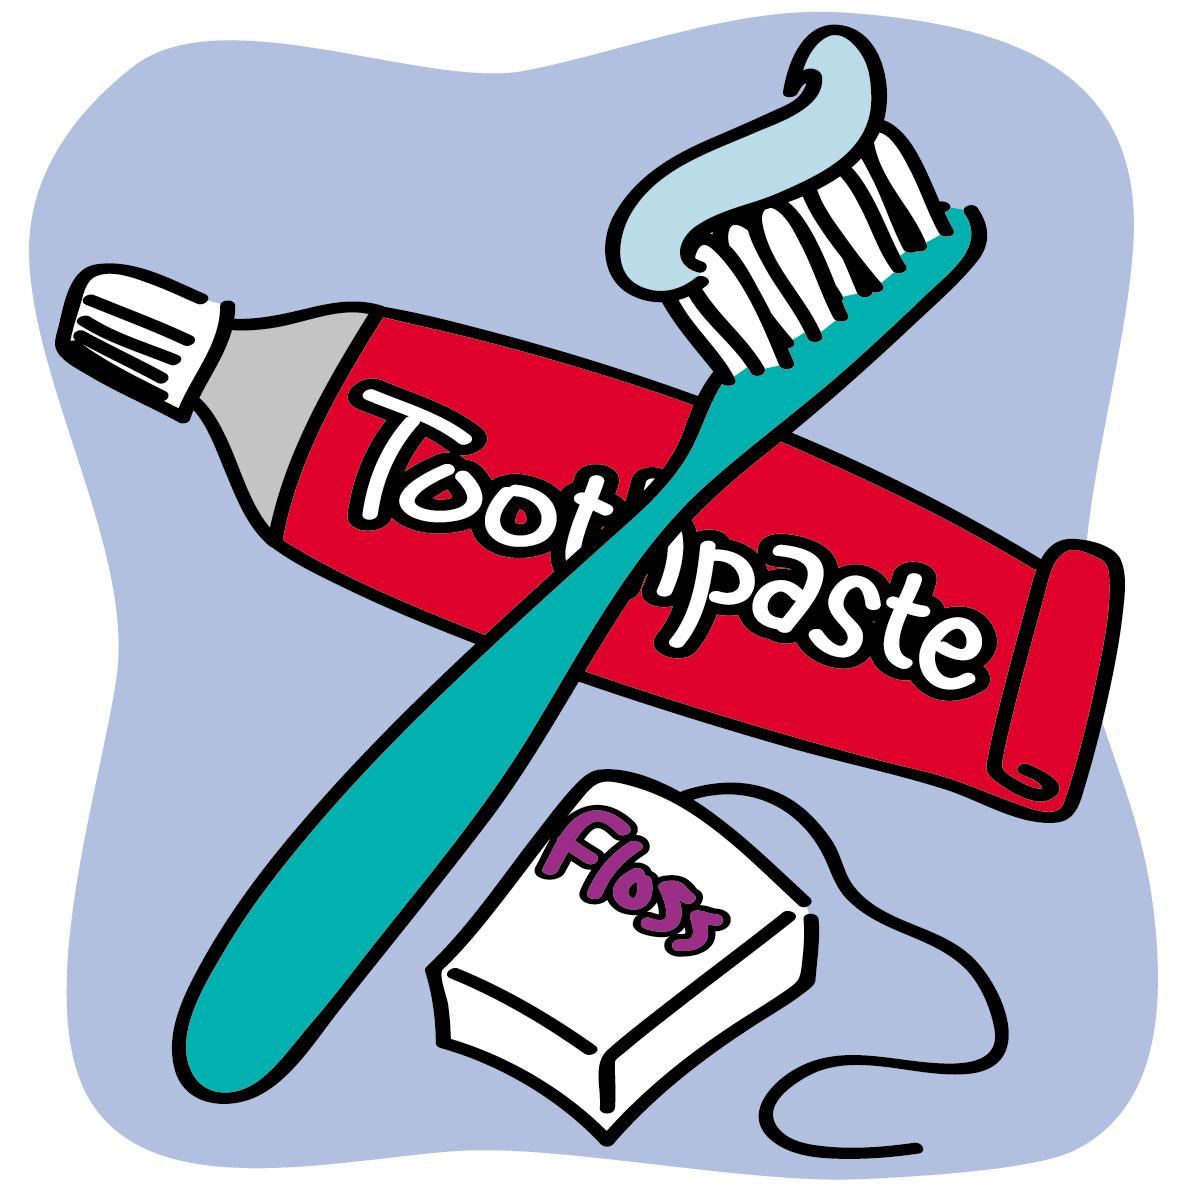 Health clipart dental health. Station